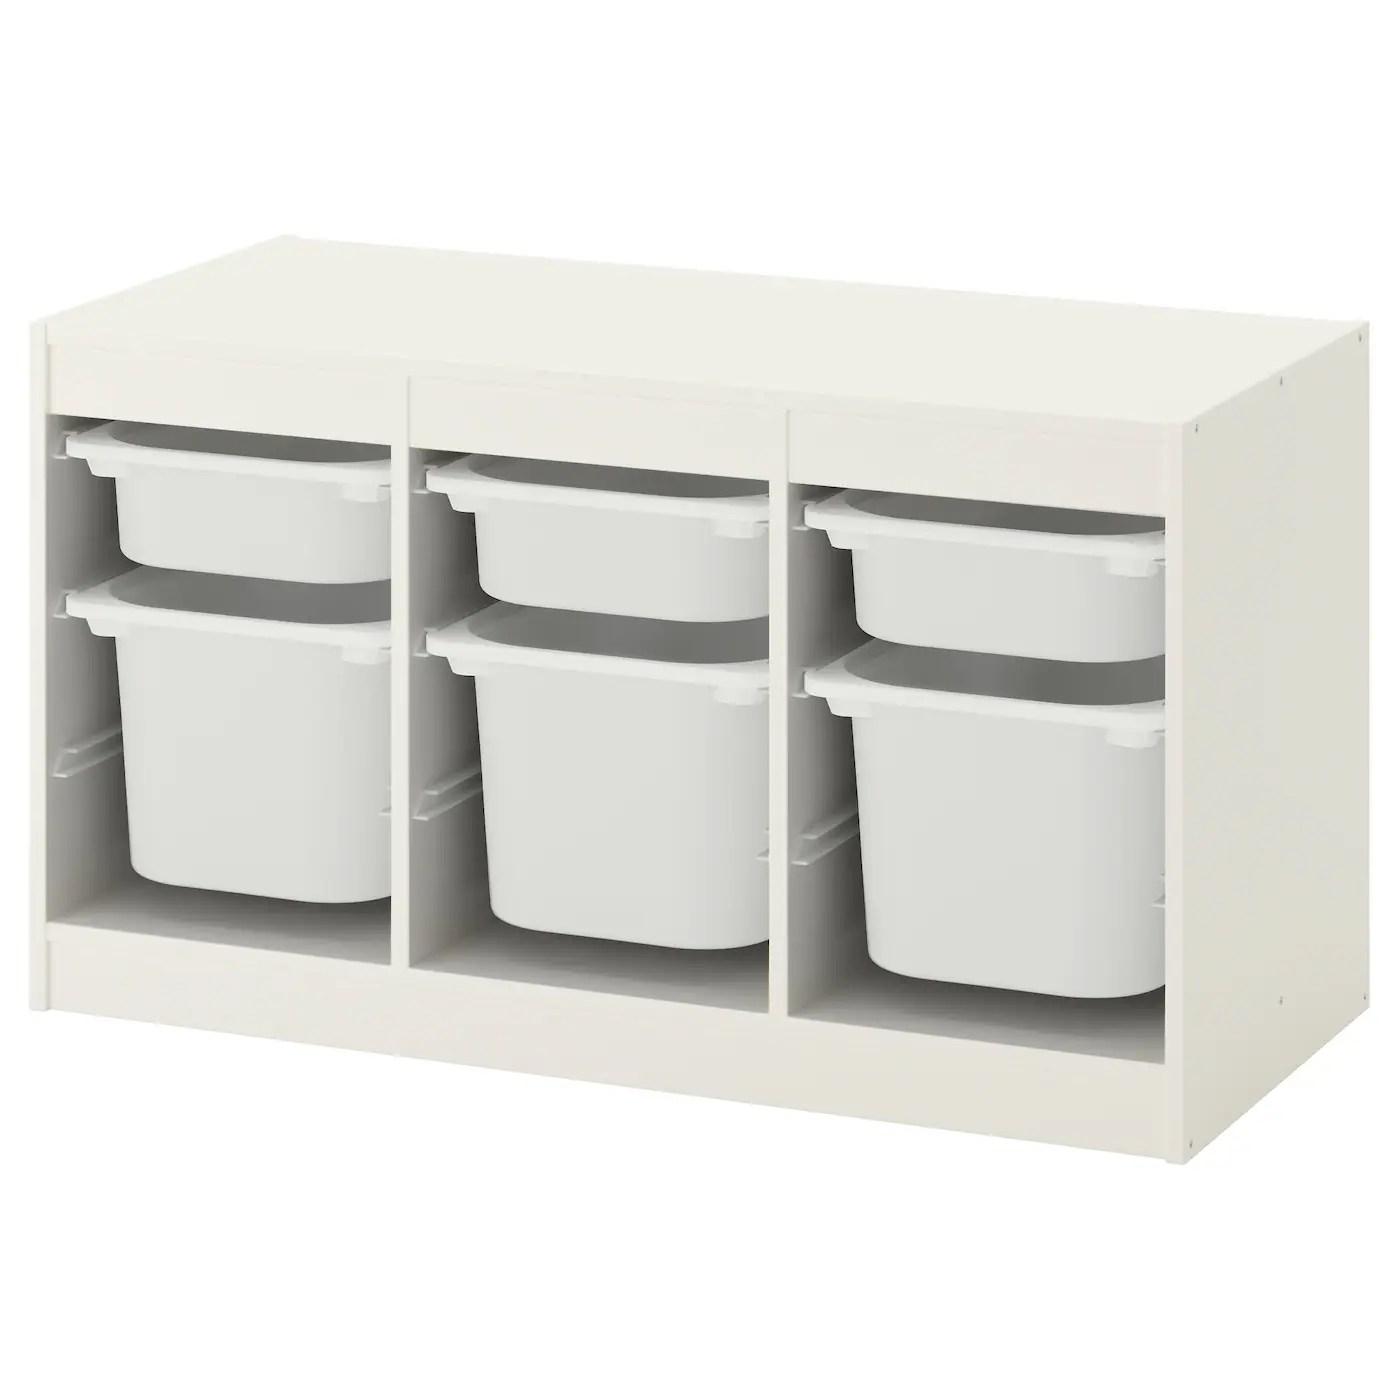 trofast combi rangement boites blanc blanc 99x44x56 cm